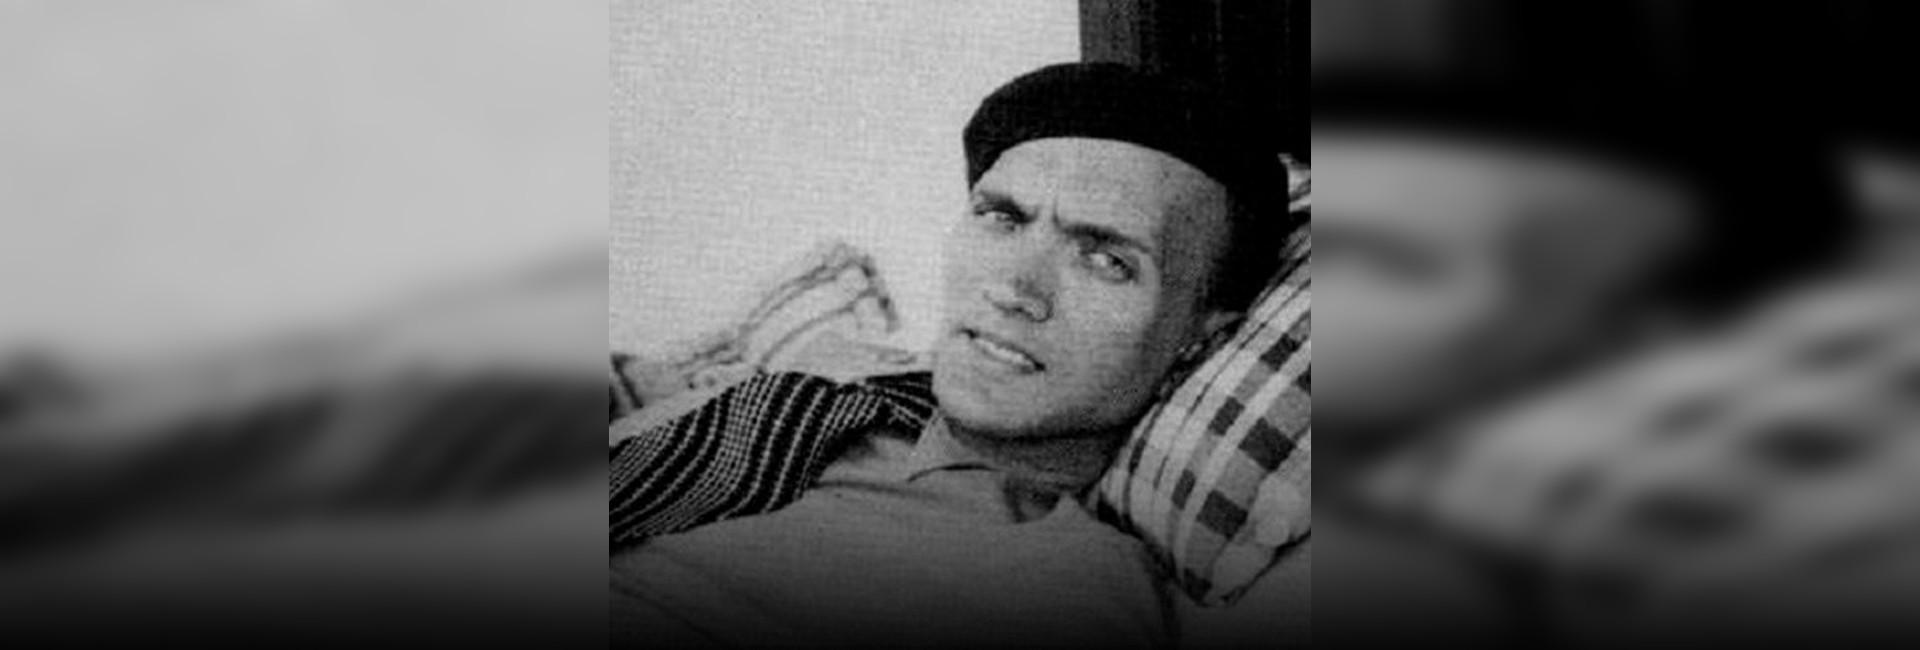 portret Max Blecher scriitorul singur oprimat de vid embleme cultura română slider